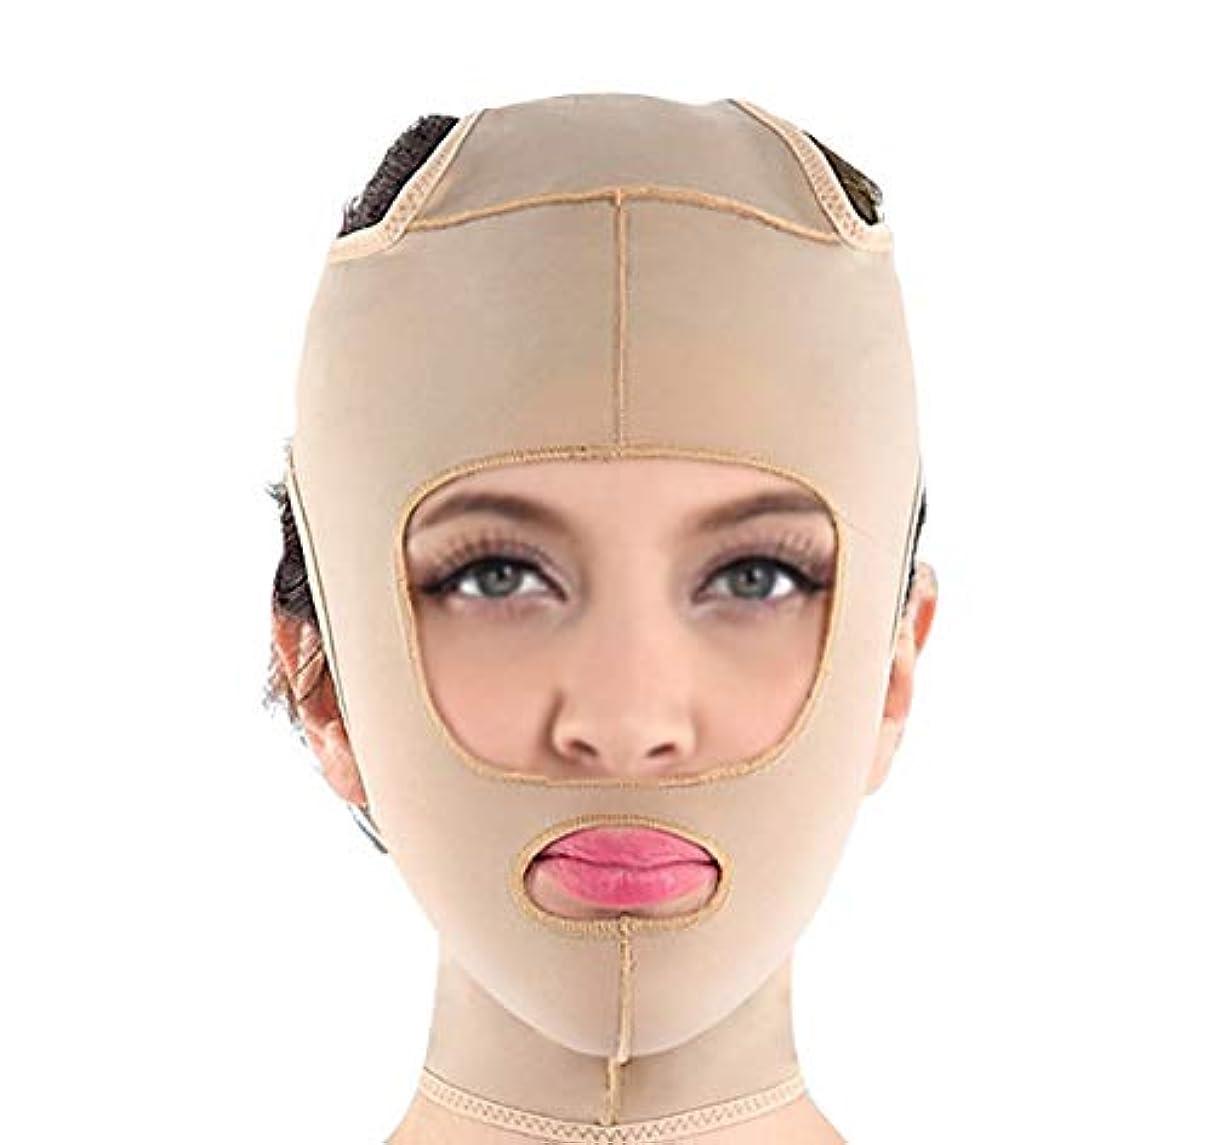 XHLMRMJ 肌をしっかりと保ち、顔の筋肉の垂れ下がりや顔の美しい輪郭の形成を防ぐフェイスリフティングマスク (Size : L)